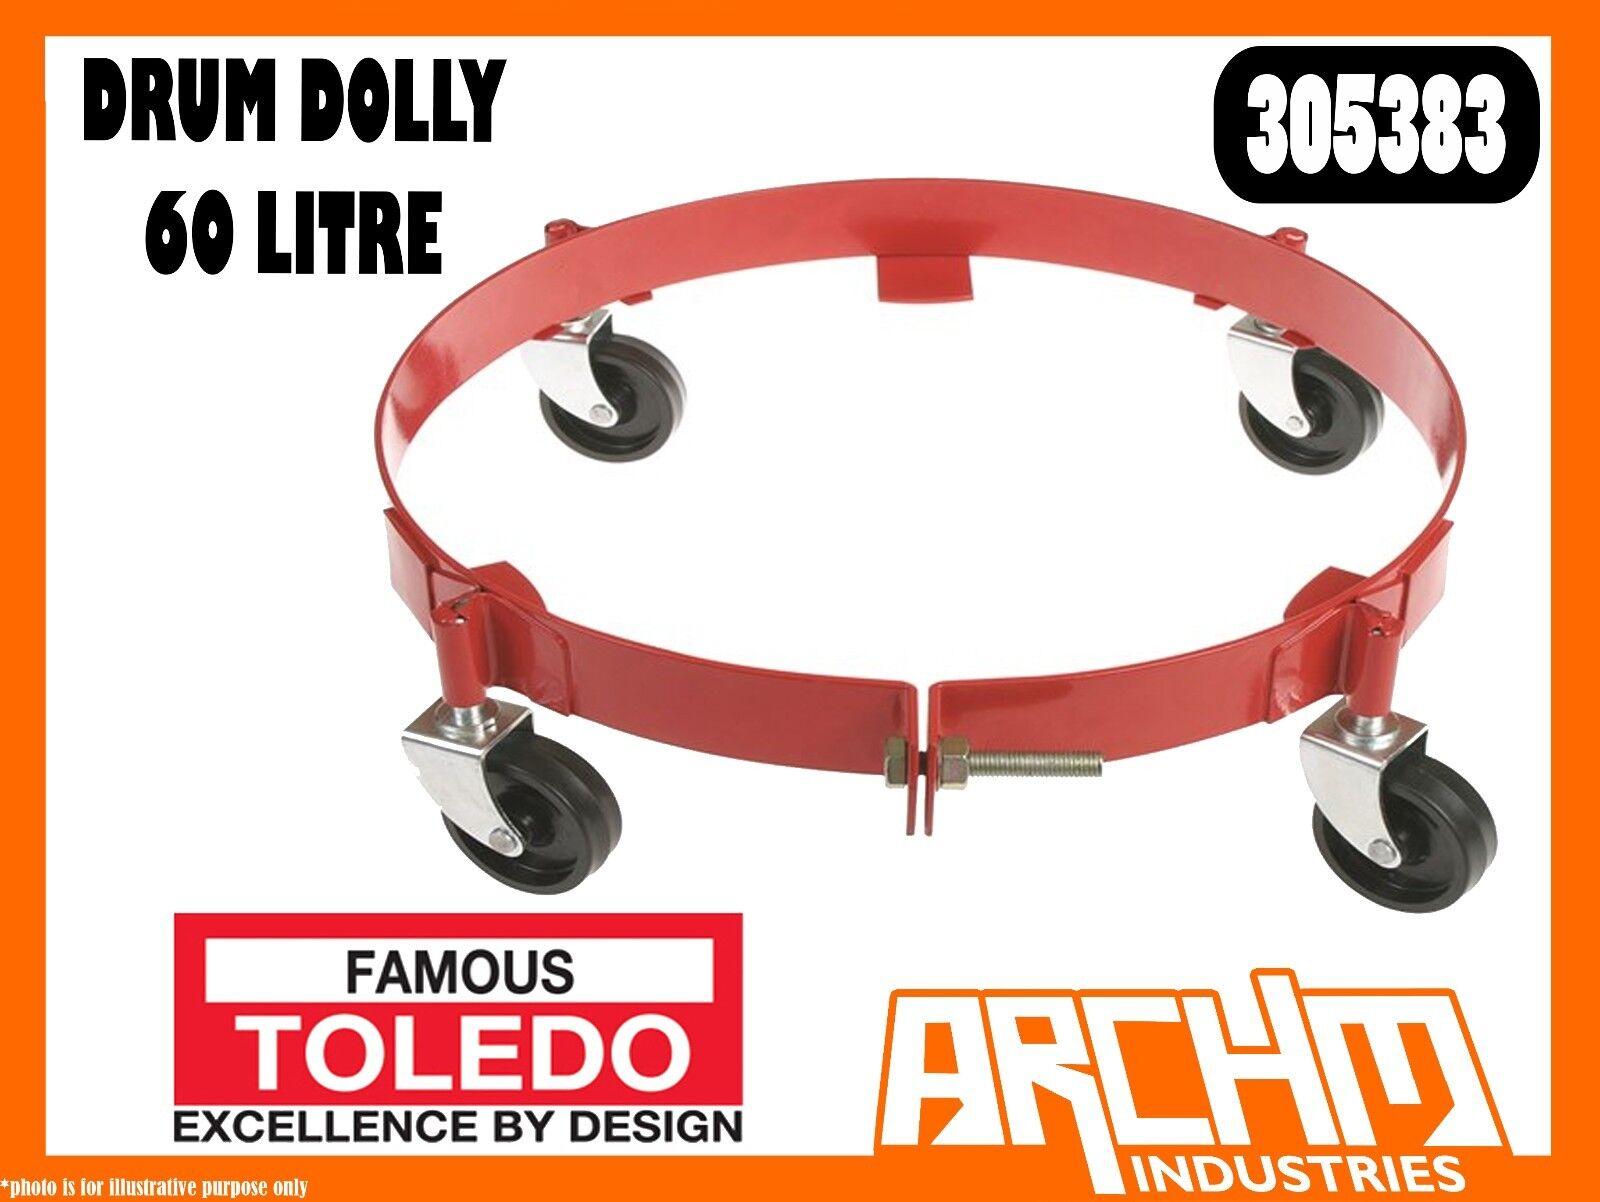 TOLEDO 305383 - DRUM DOLLY - 60 LITRE - EXTRA HEAVY DUTY STEEL POWDER COATED